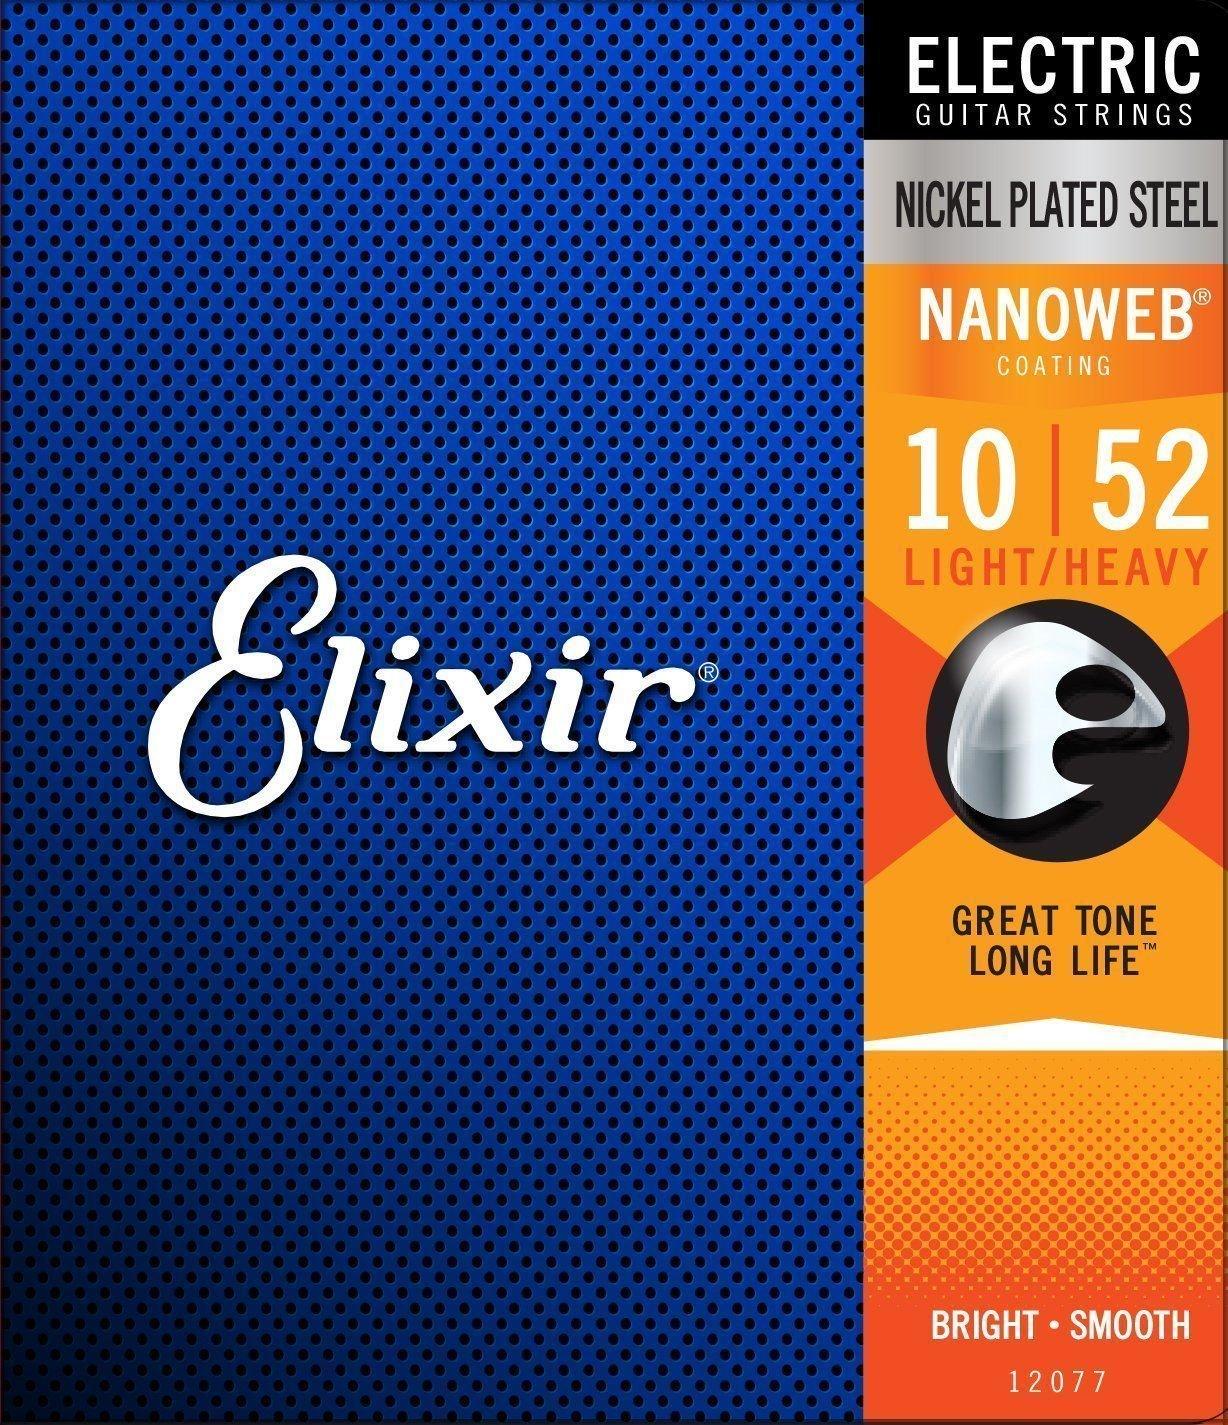 Elixir 12077 Nanoweb 10/52